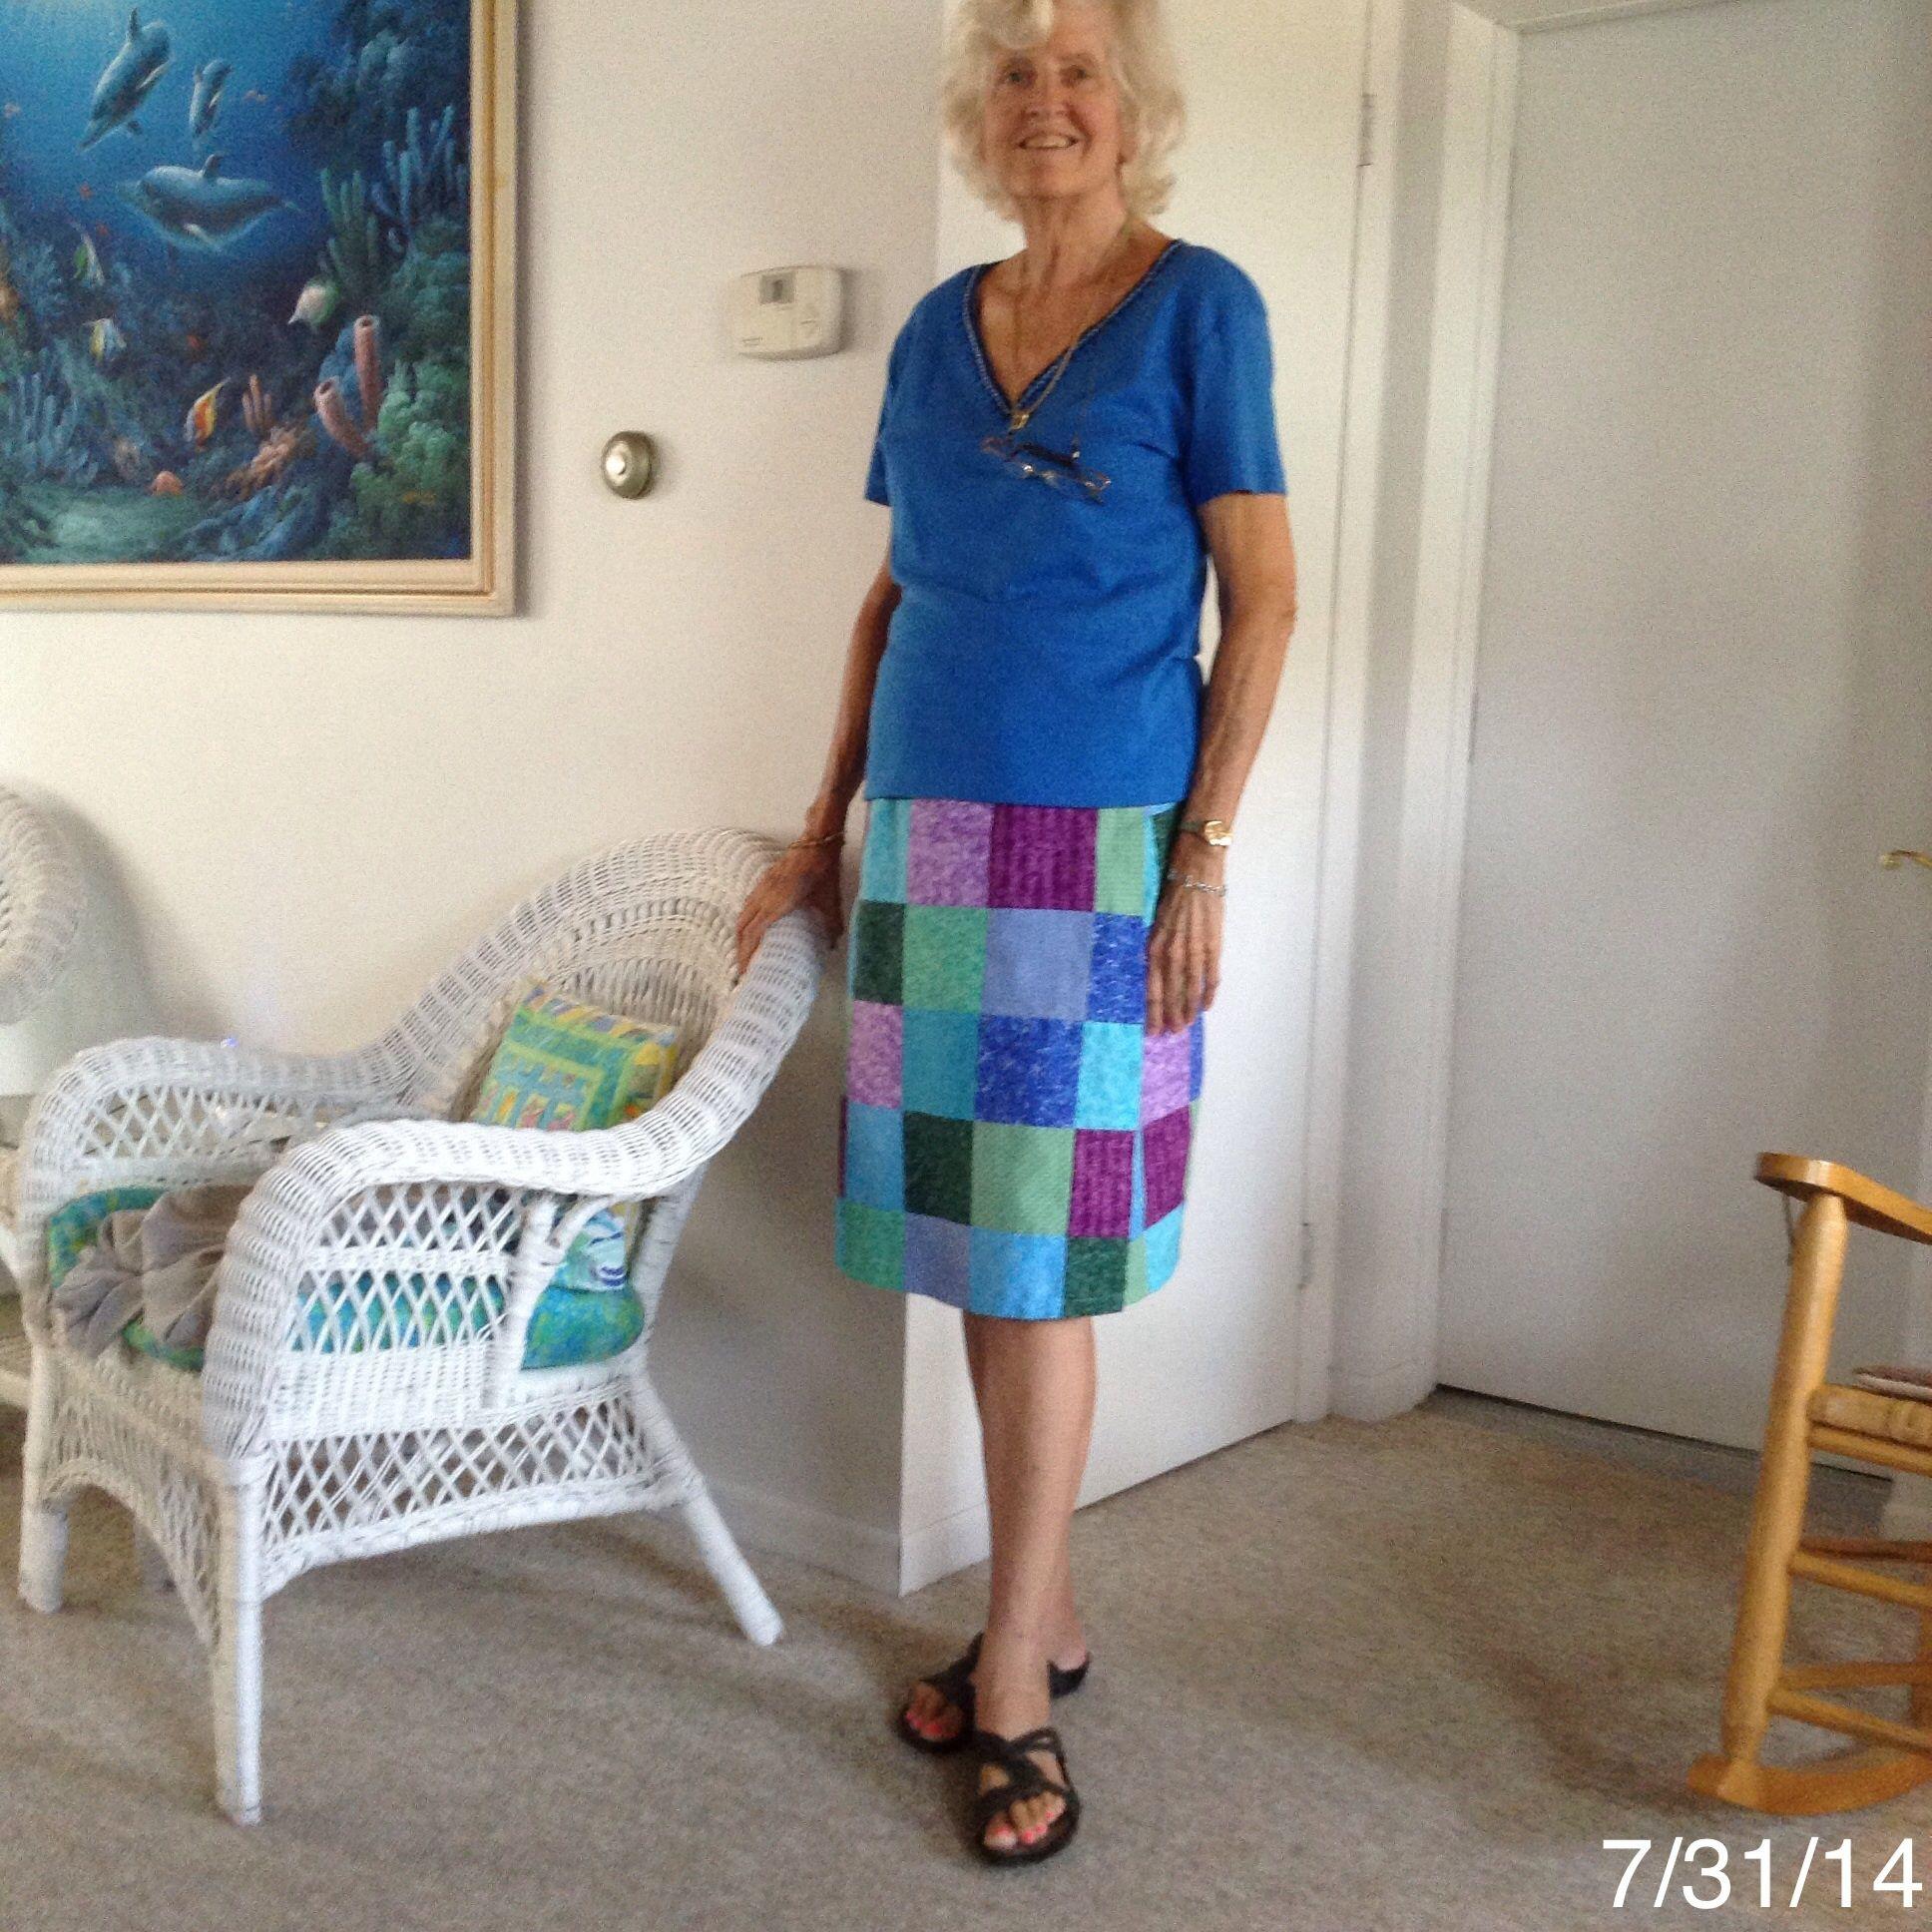 Handmade patchwork wrap skirt, tee top with beaded neck trim.